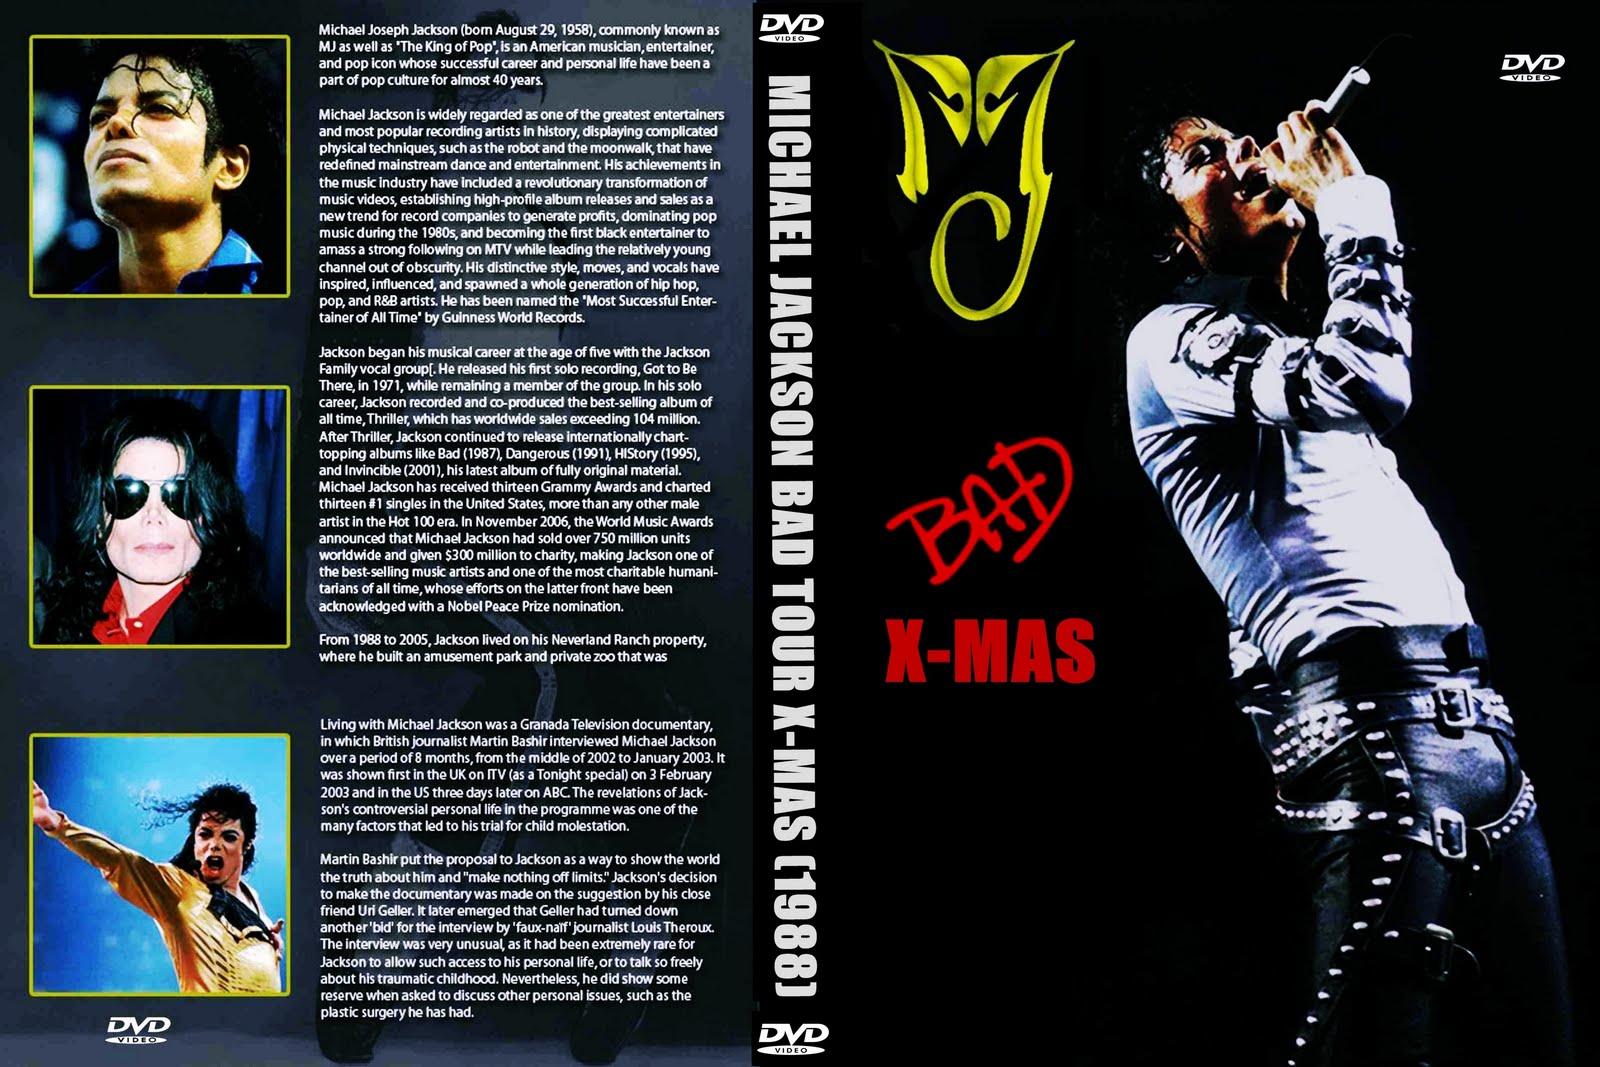 http://2.bp.blogspot.com/_u_22hnwm6Qk/TEY2tdH4bRI/AAAAAAAABV0/dcCpRTfhBGI/s1600/Michael-Jackson-Living-With.jpg